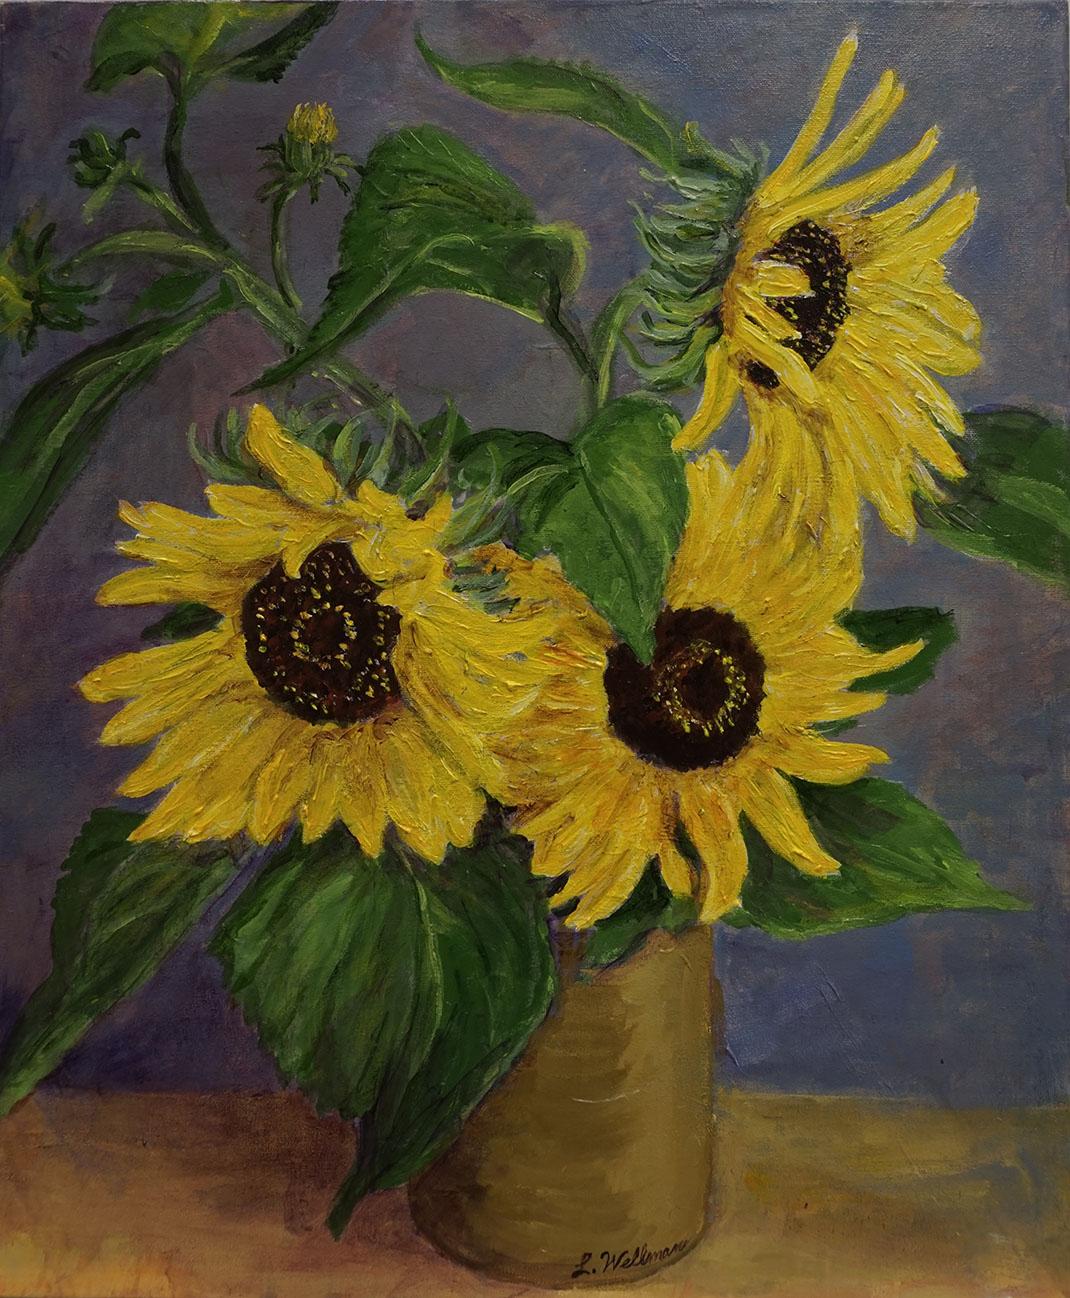 "Loraine Wellman, ""Sunflowers (Homage to Van Gogh)"", 2014, Acrylic on Canvas, 24 x 20 inches. Estimate: $500"